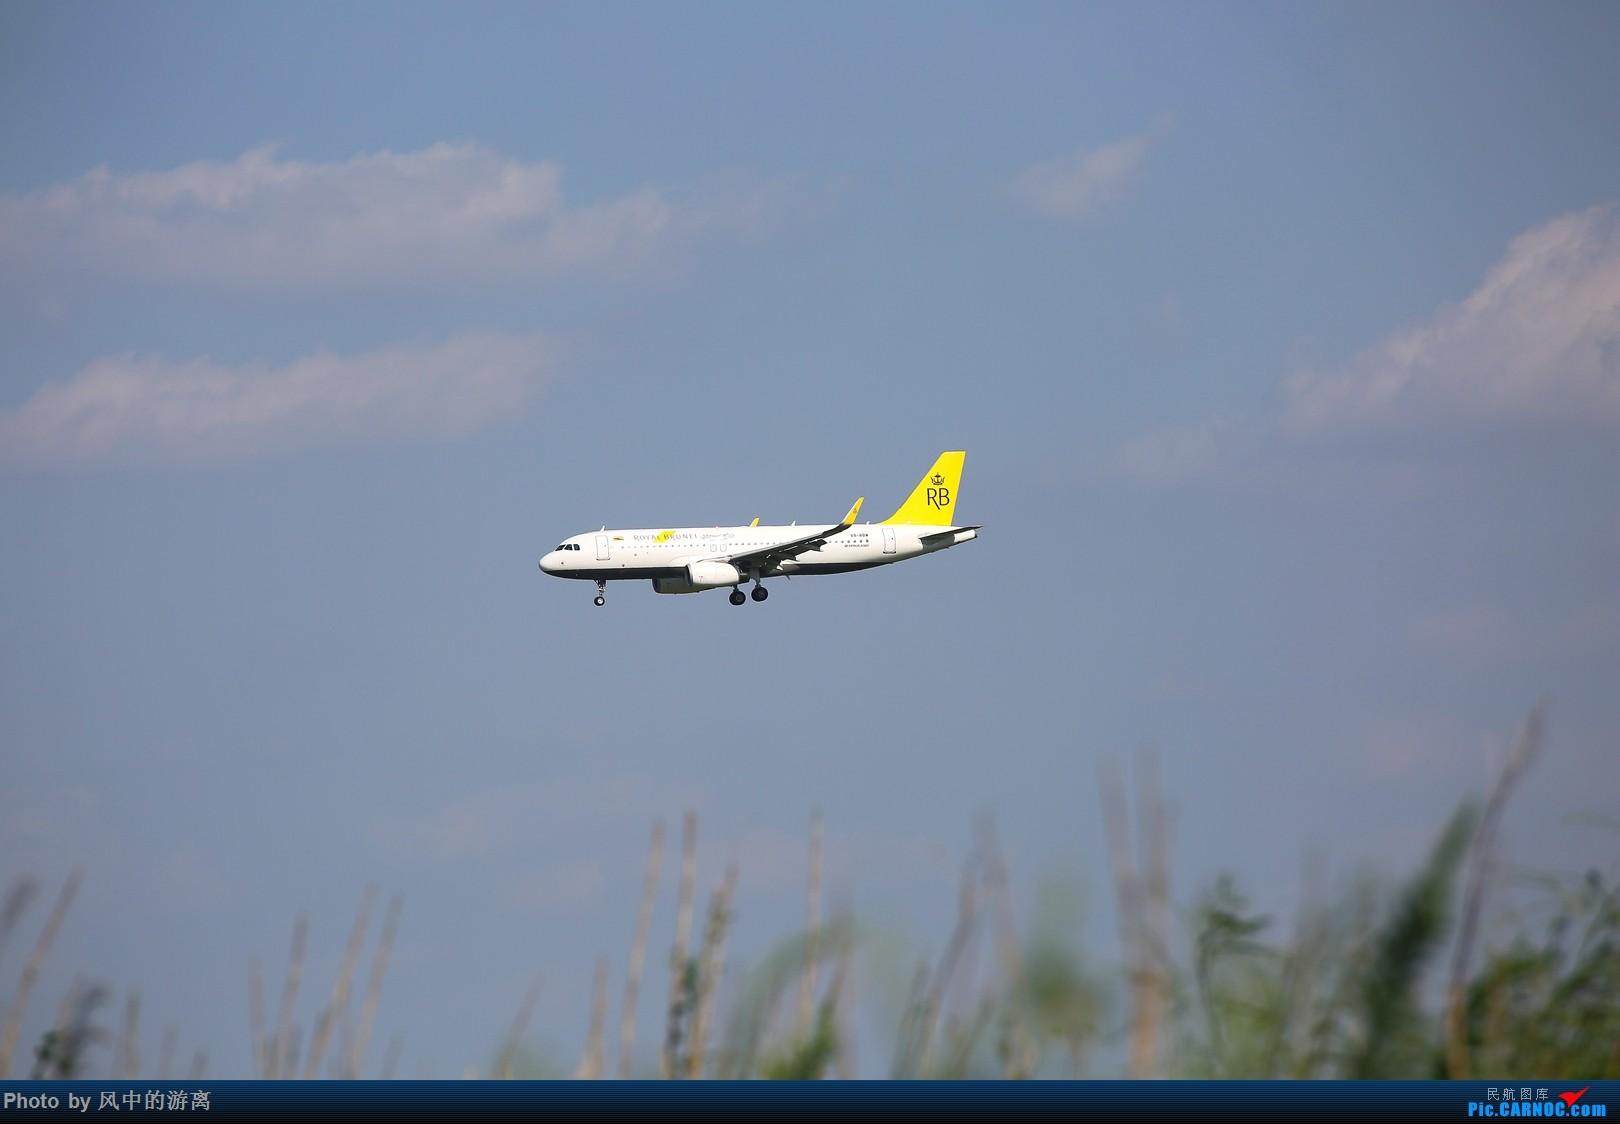 Re:[原创]转季转风向,觅PVG南端 AIRBUS A320 V8-RBW 中国上海浦东国际机场